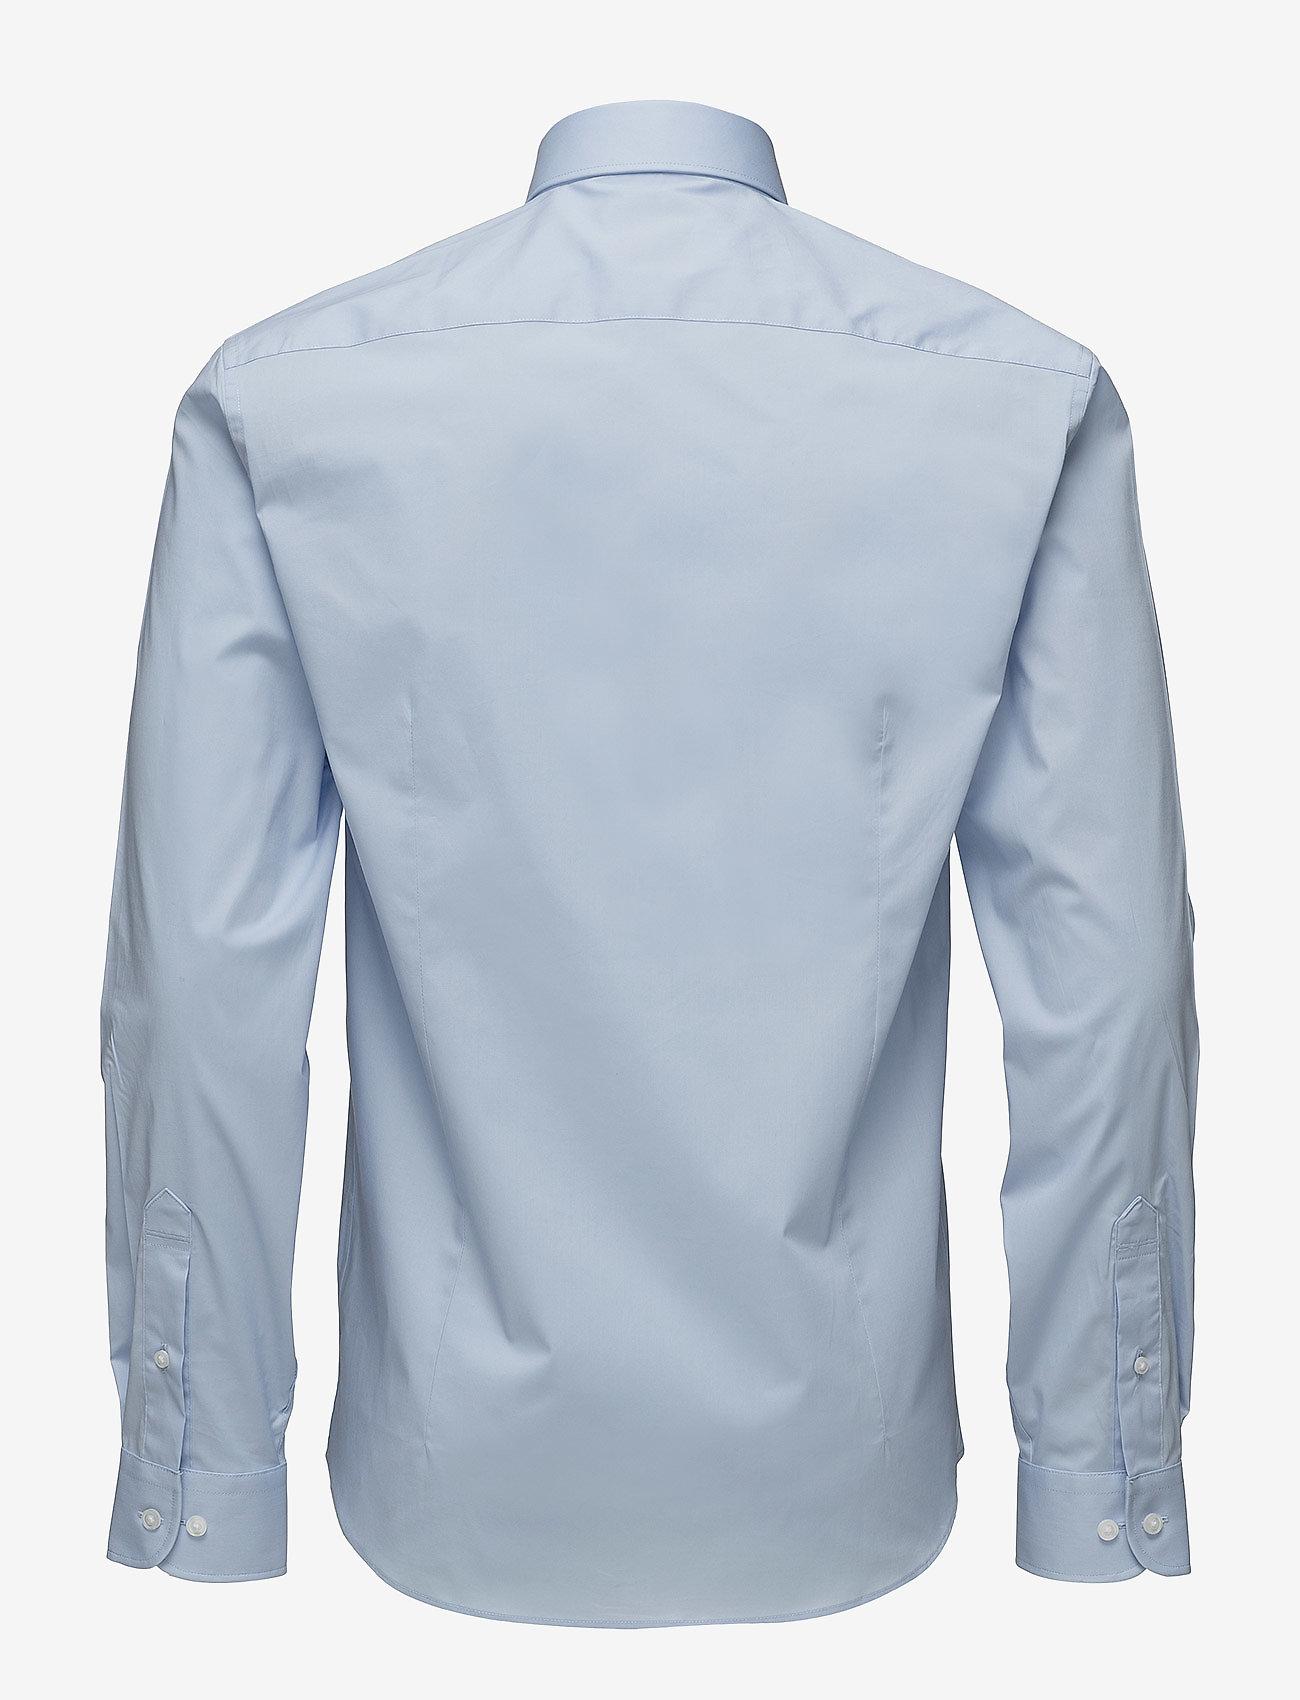 Lindbergh - Men's Stretch Shirt L/S - basic shirts - lt blue - 1